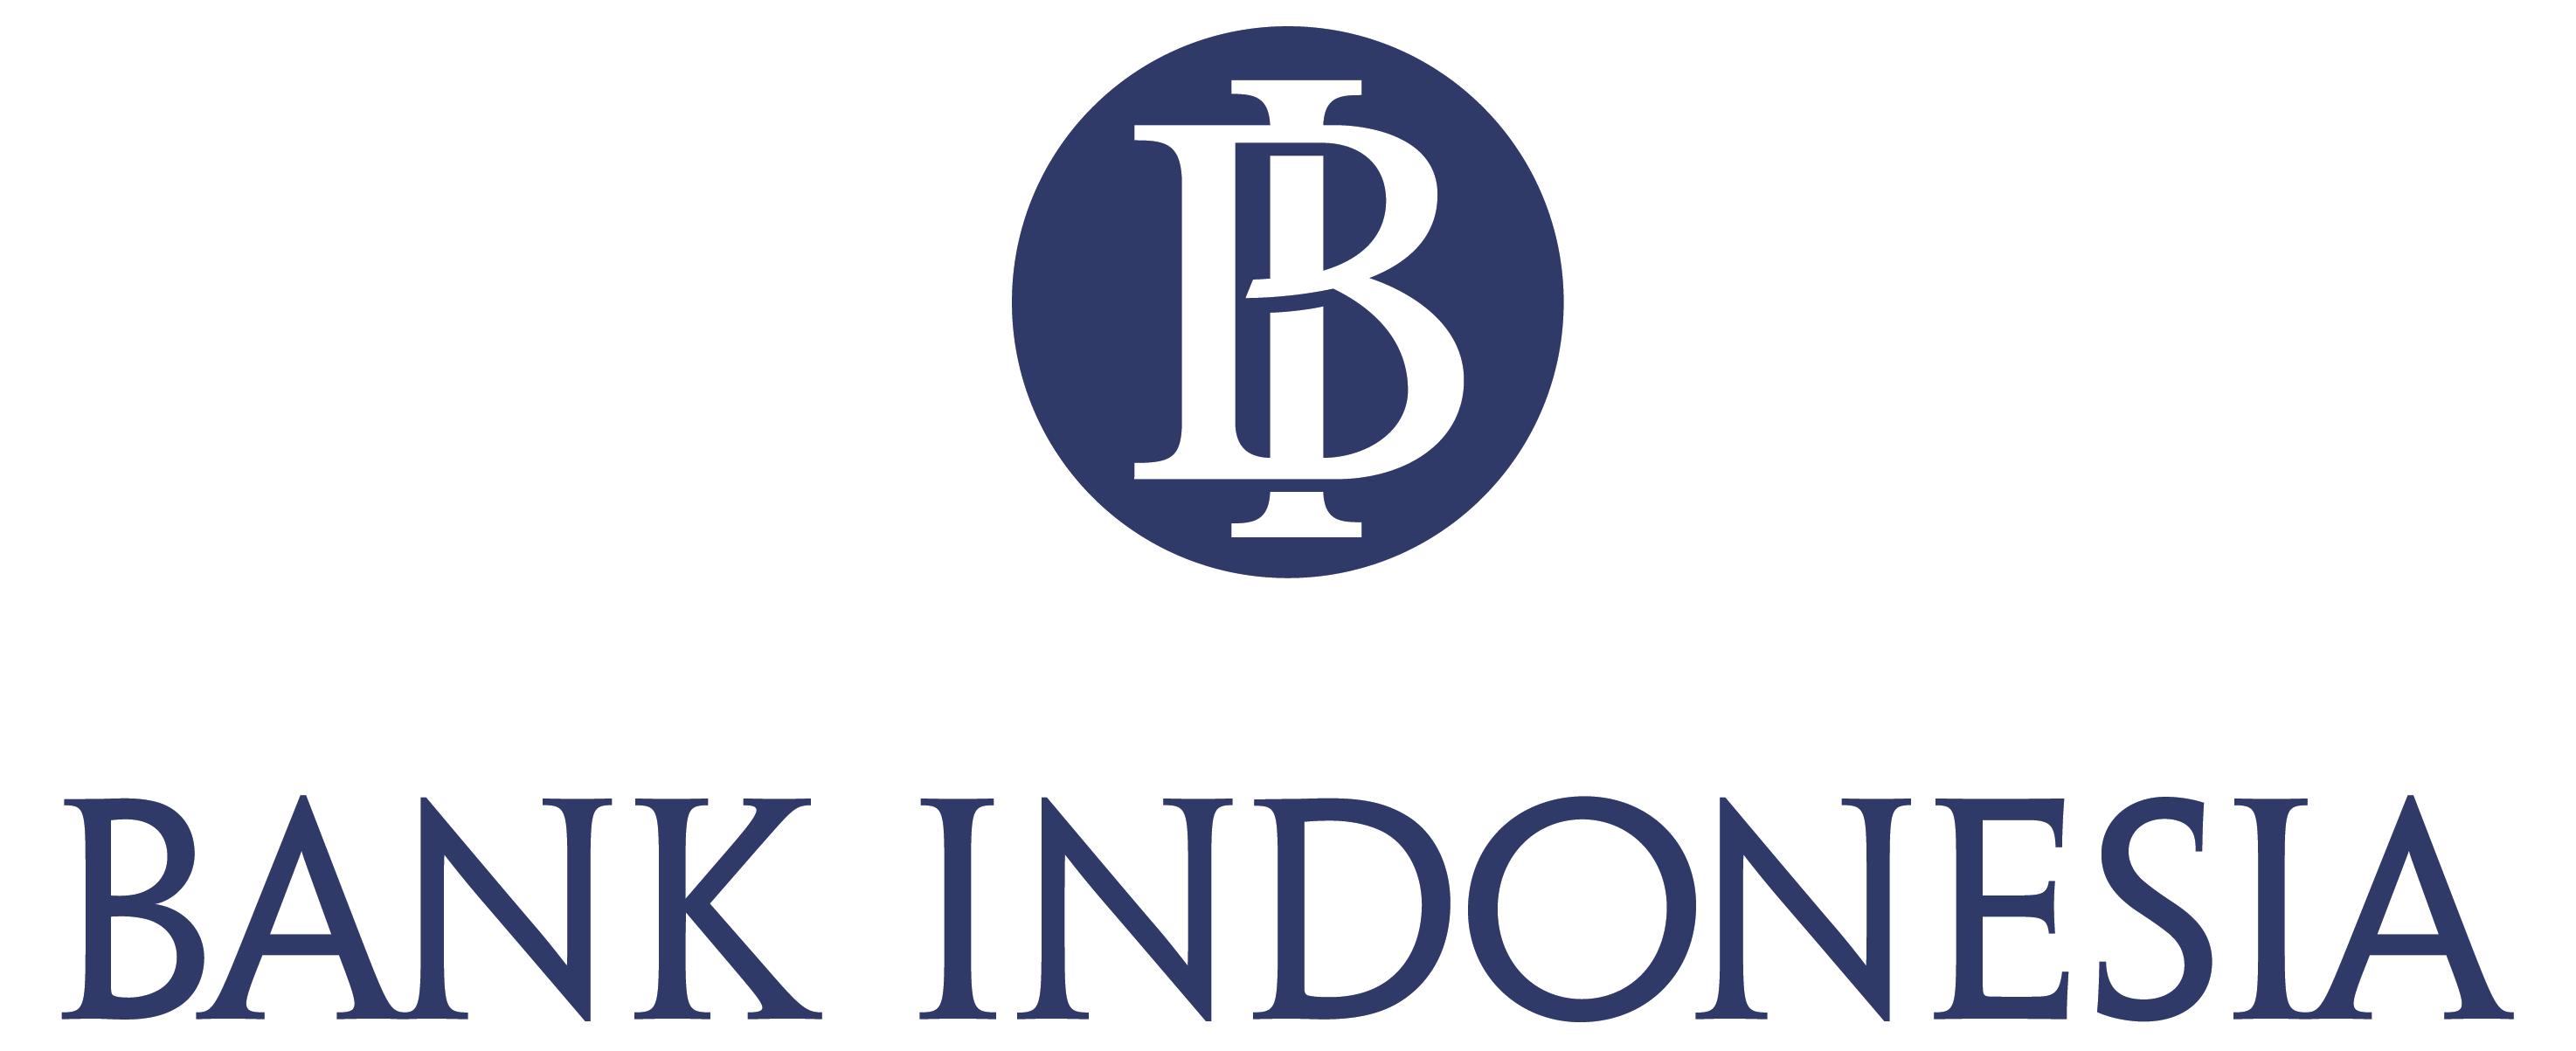 Bank Indonesia Logo photo - 1